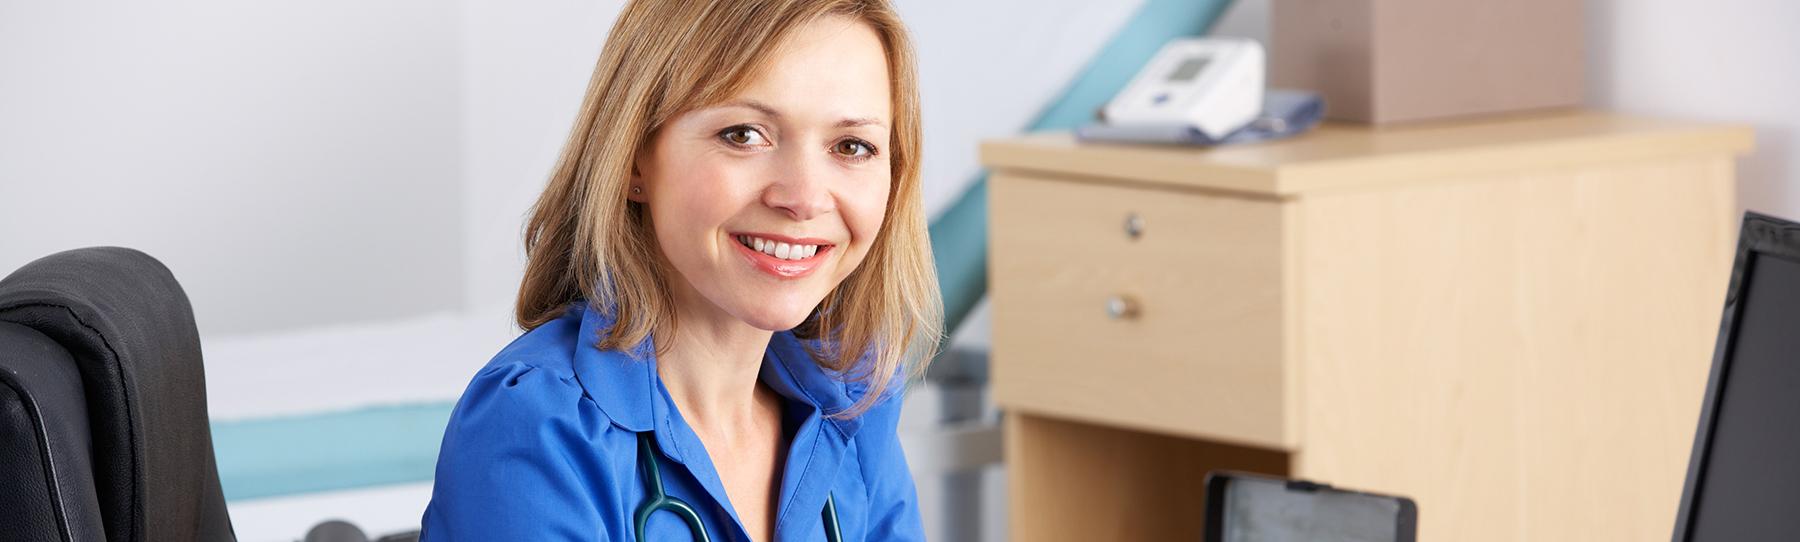 Nurse/Clinical Pharmacist/Allied Health Professional